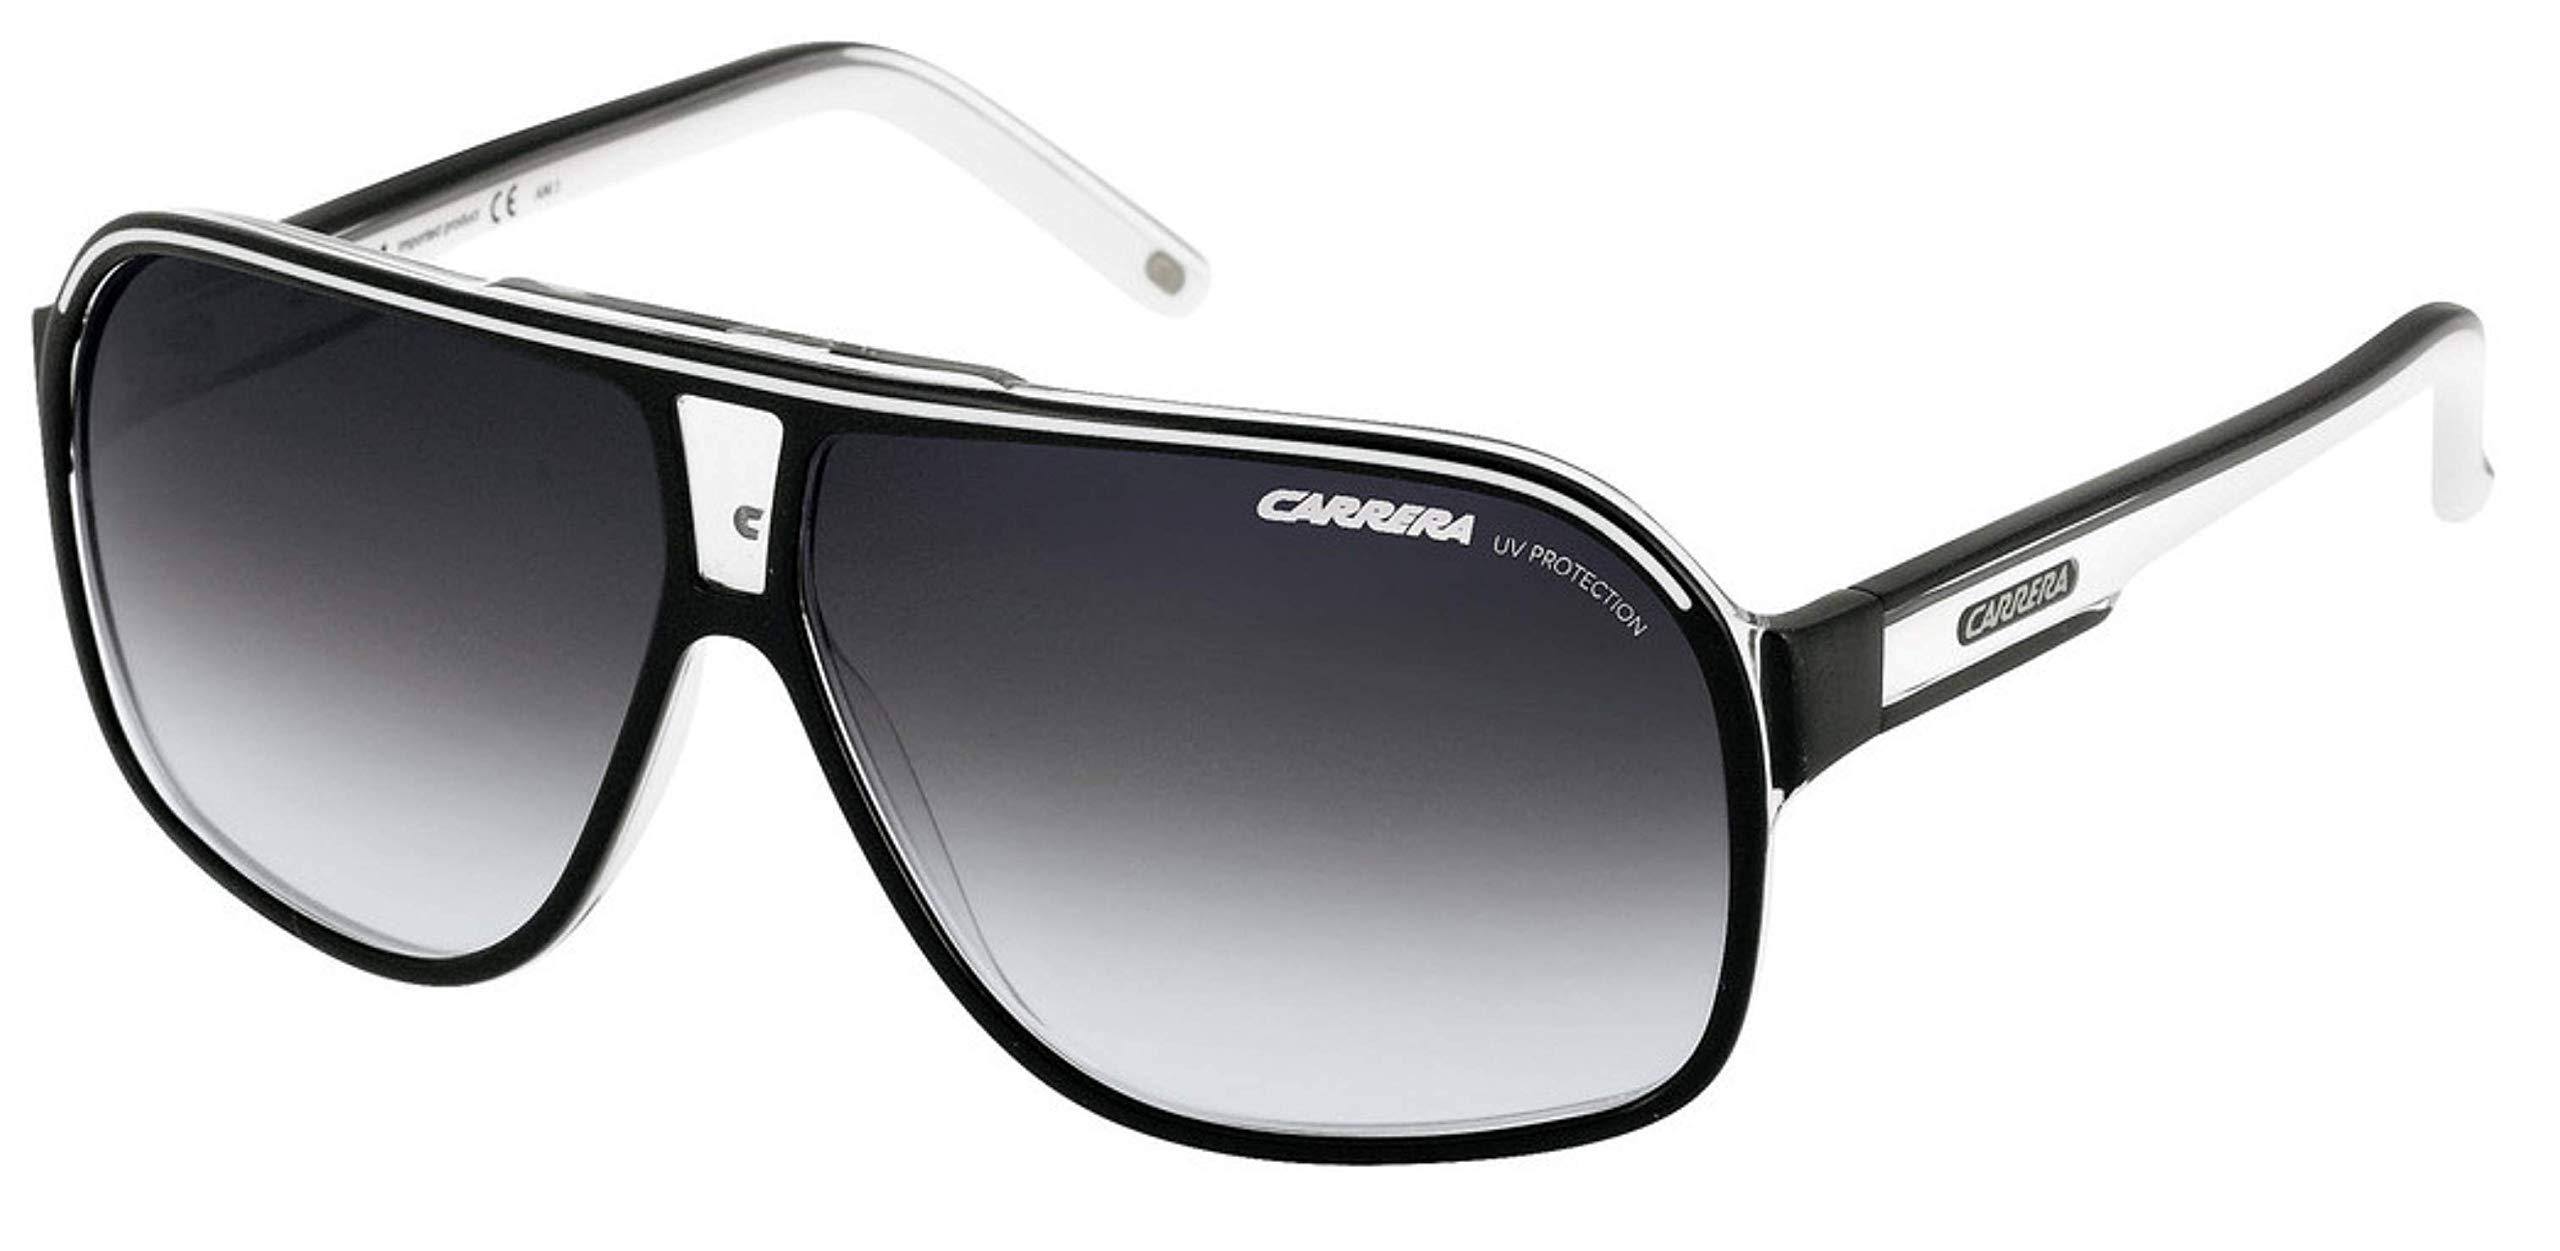 Carrera Grand Prix 2 T4M Pilot Sunglasses Lens Categ, Black/White, 64mm